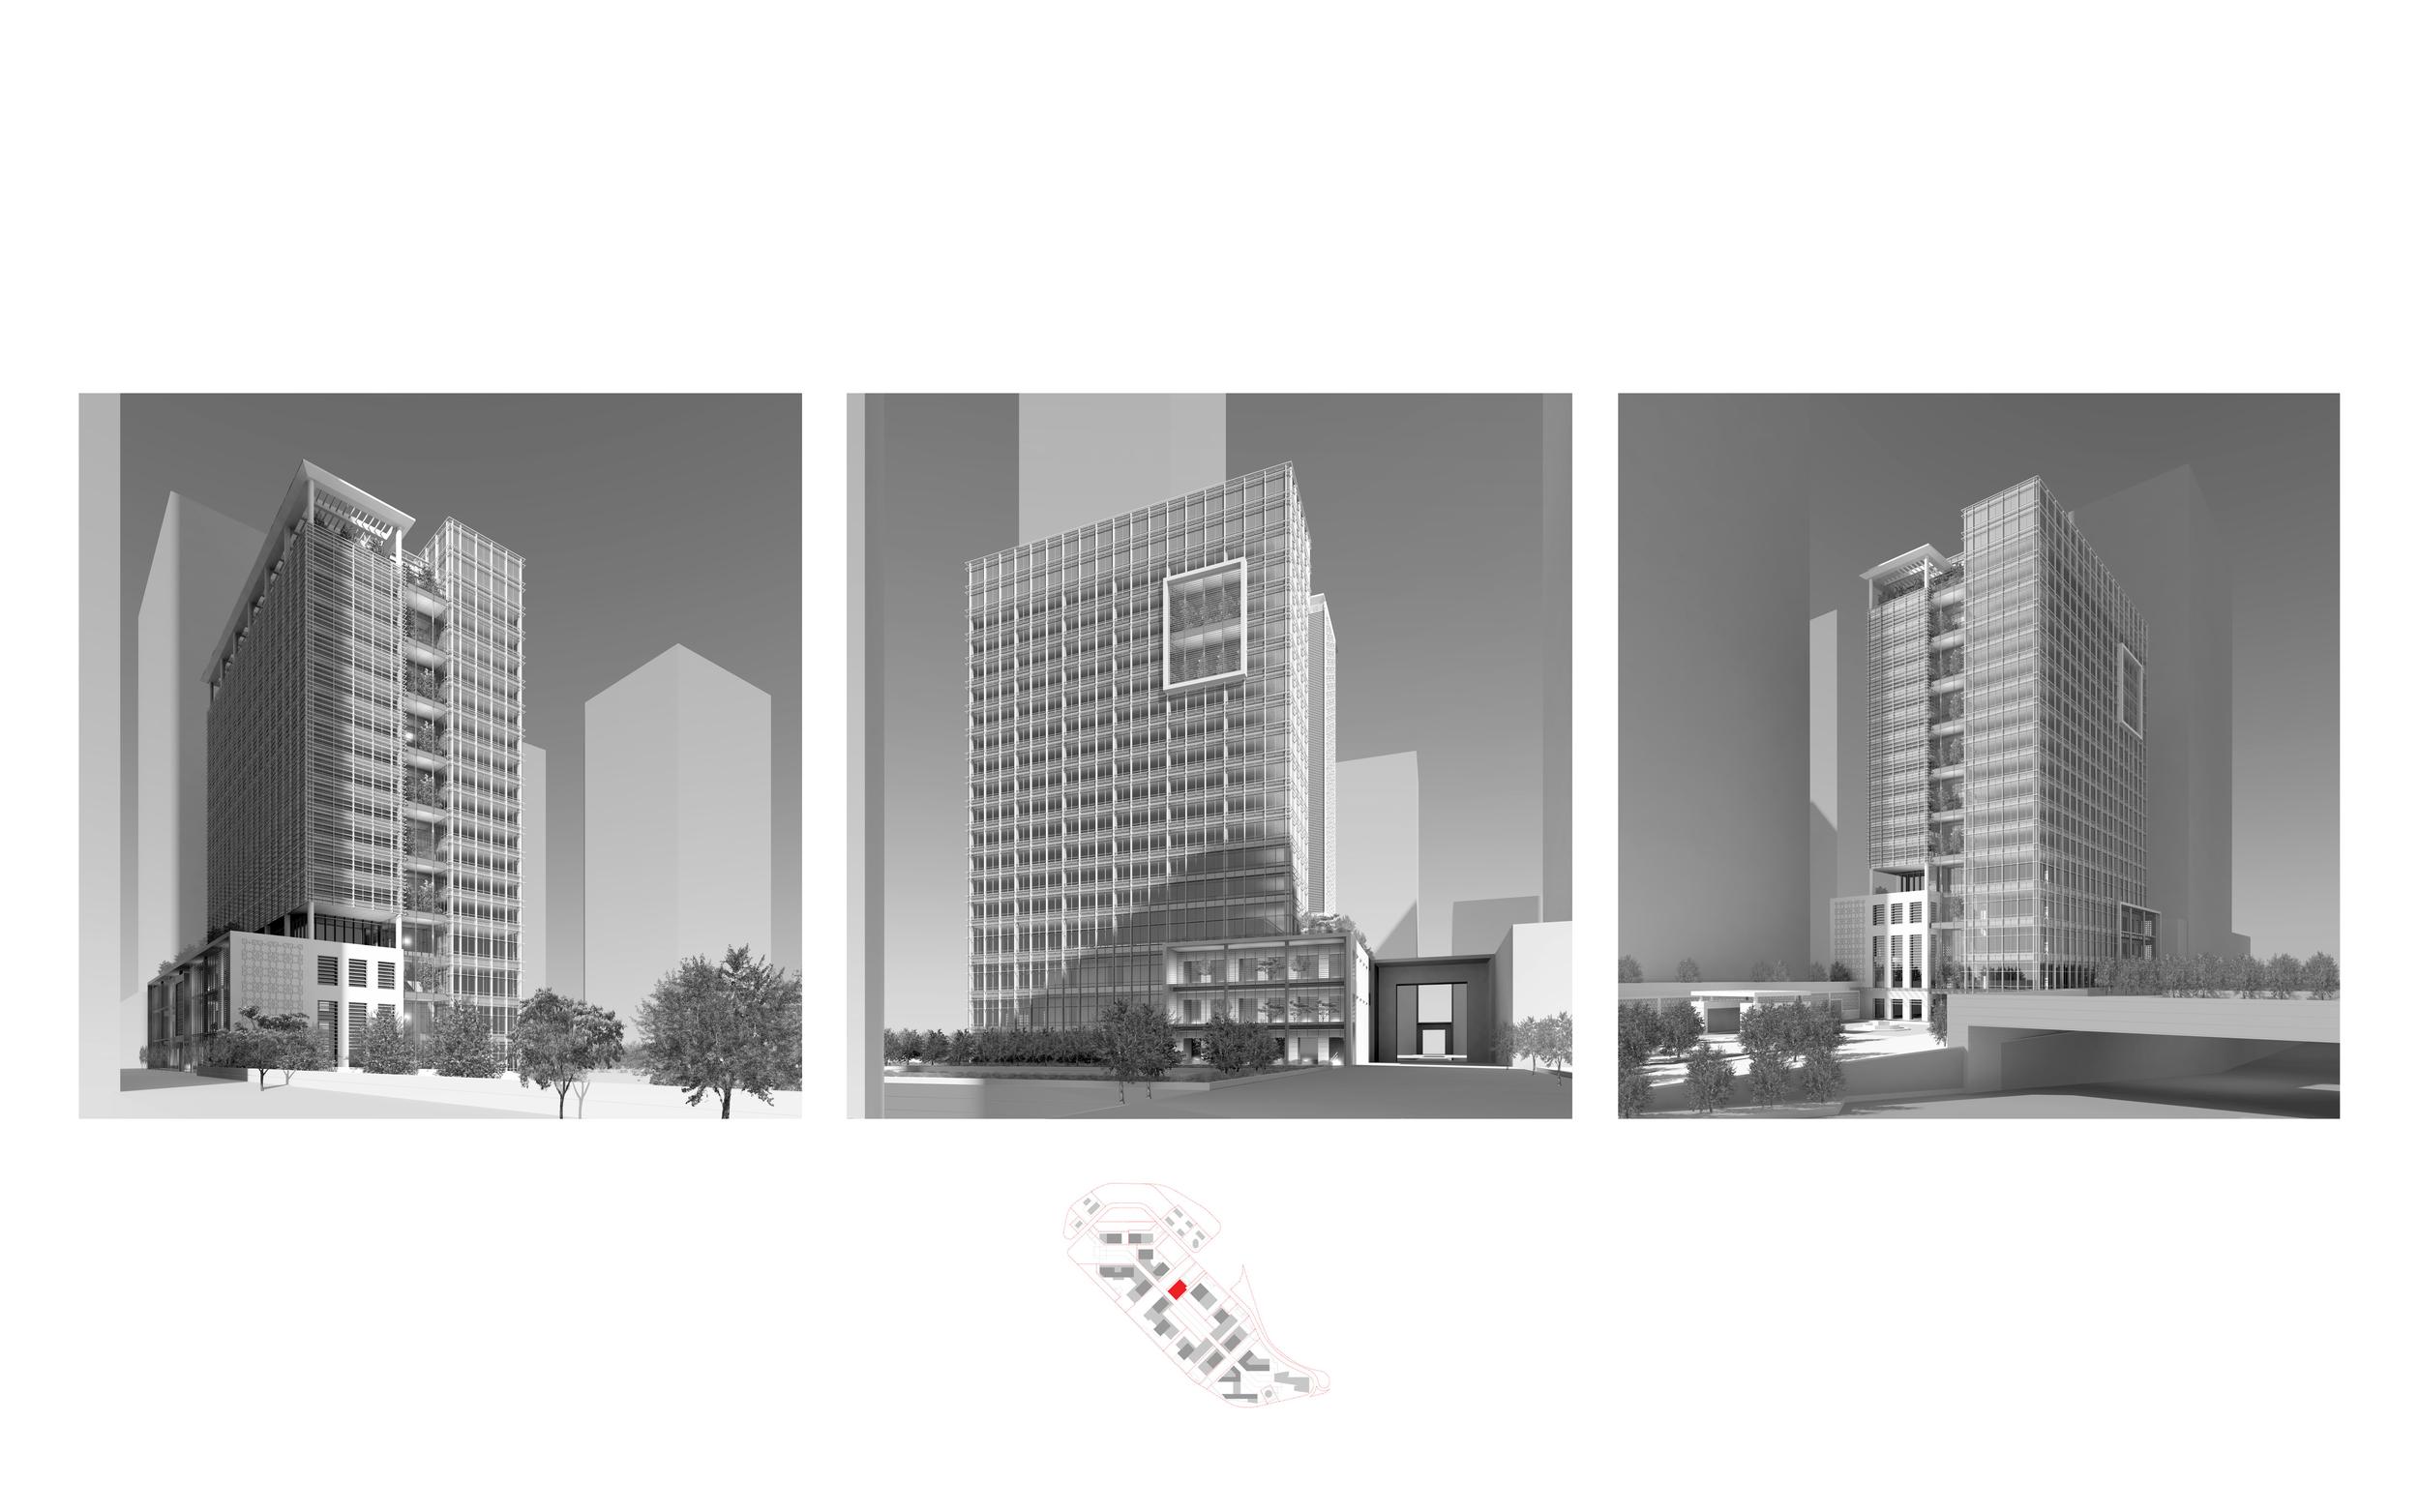 6     DESIGN PRINCIPAL: TODD HALAMKA        ARCHITECT: HOK